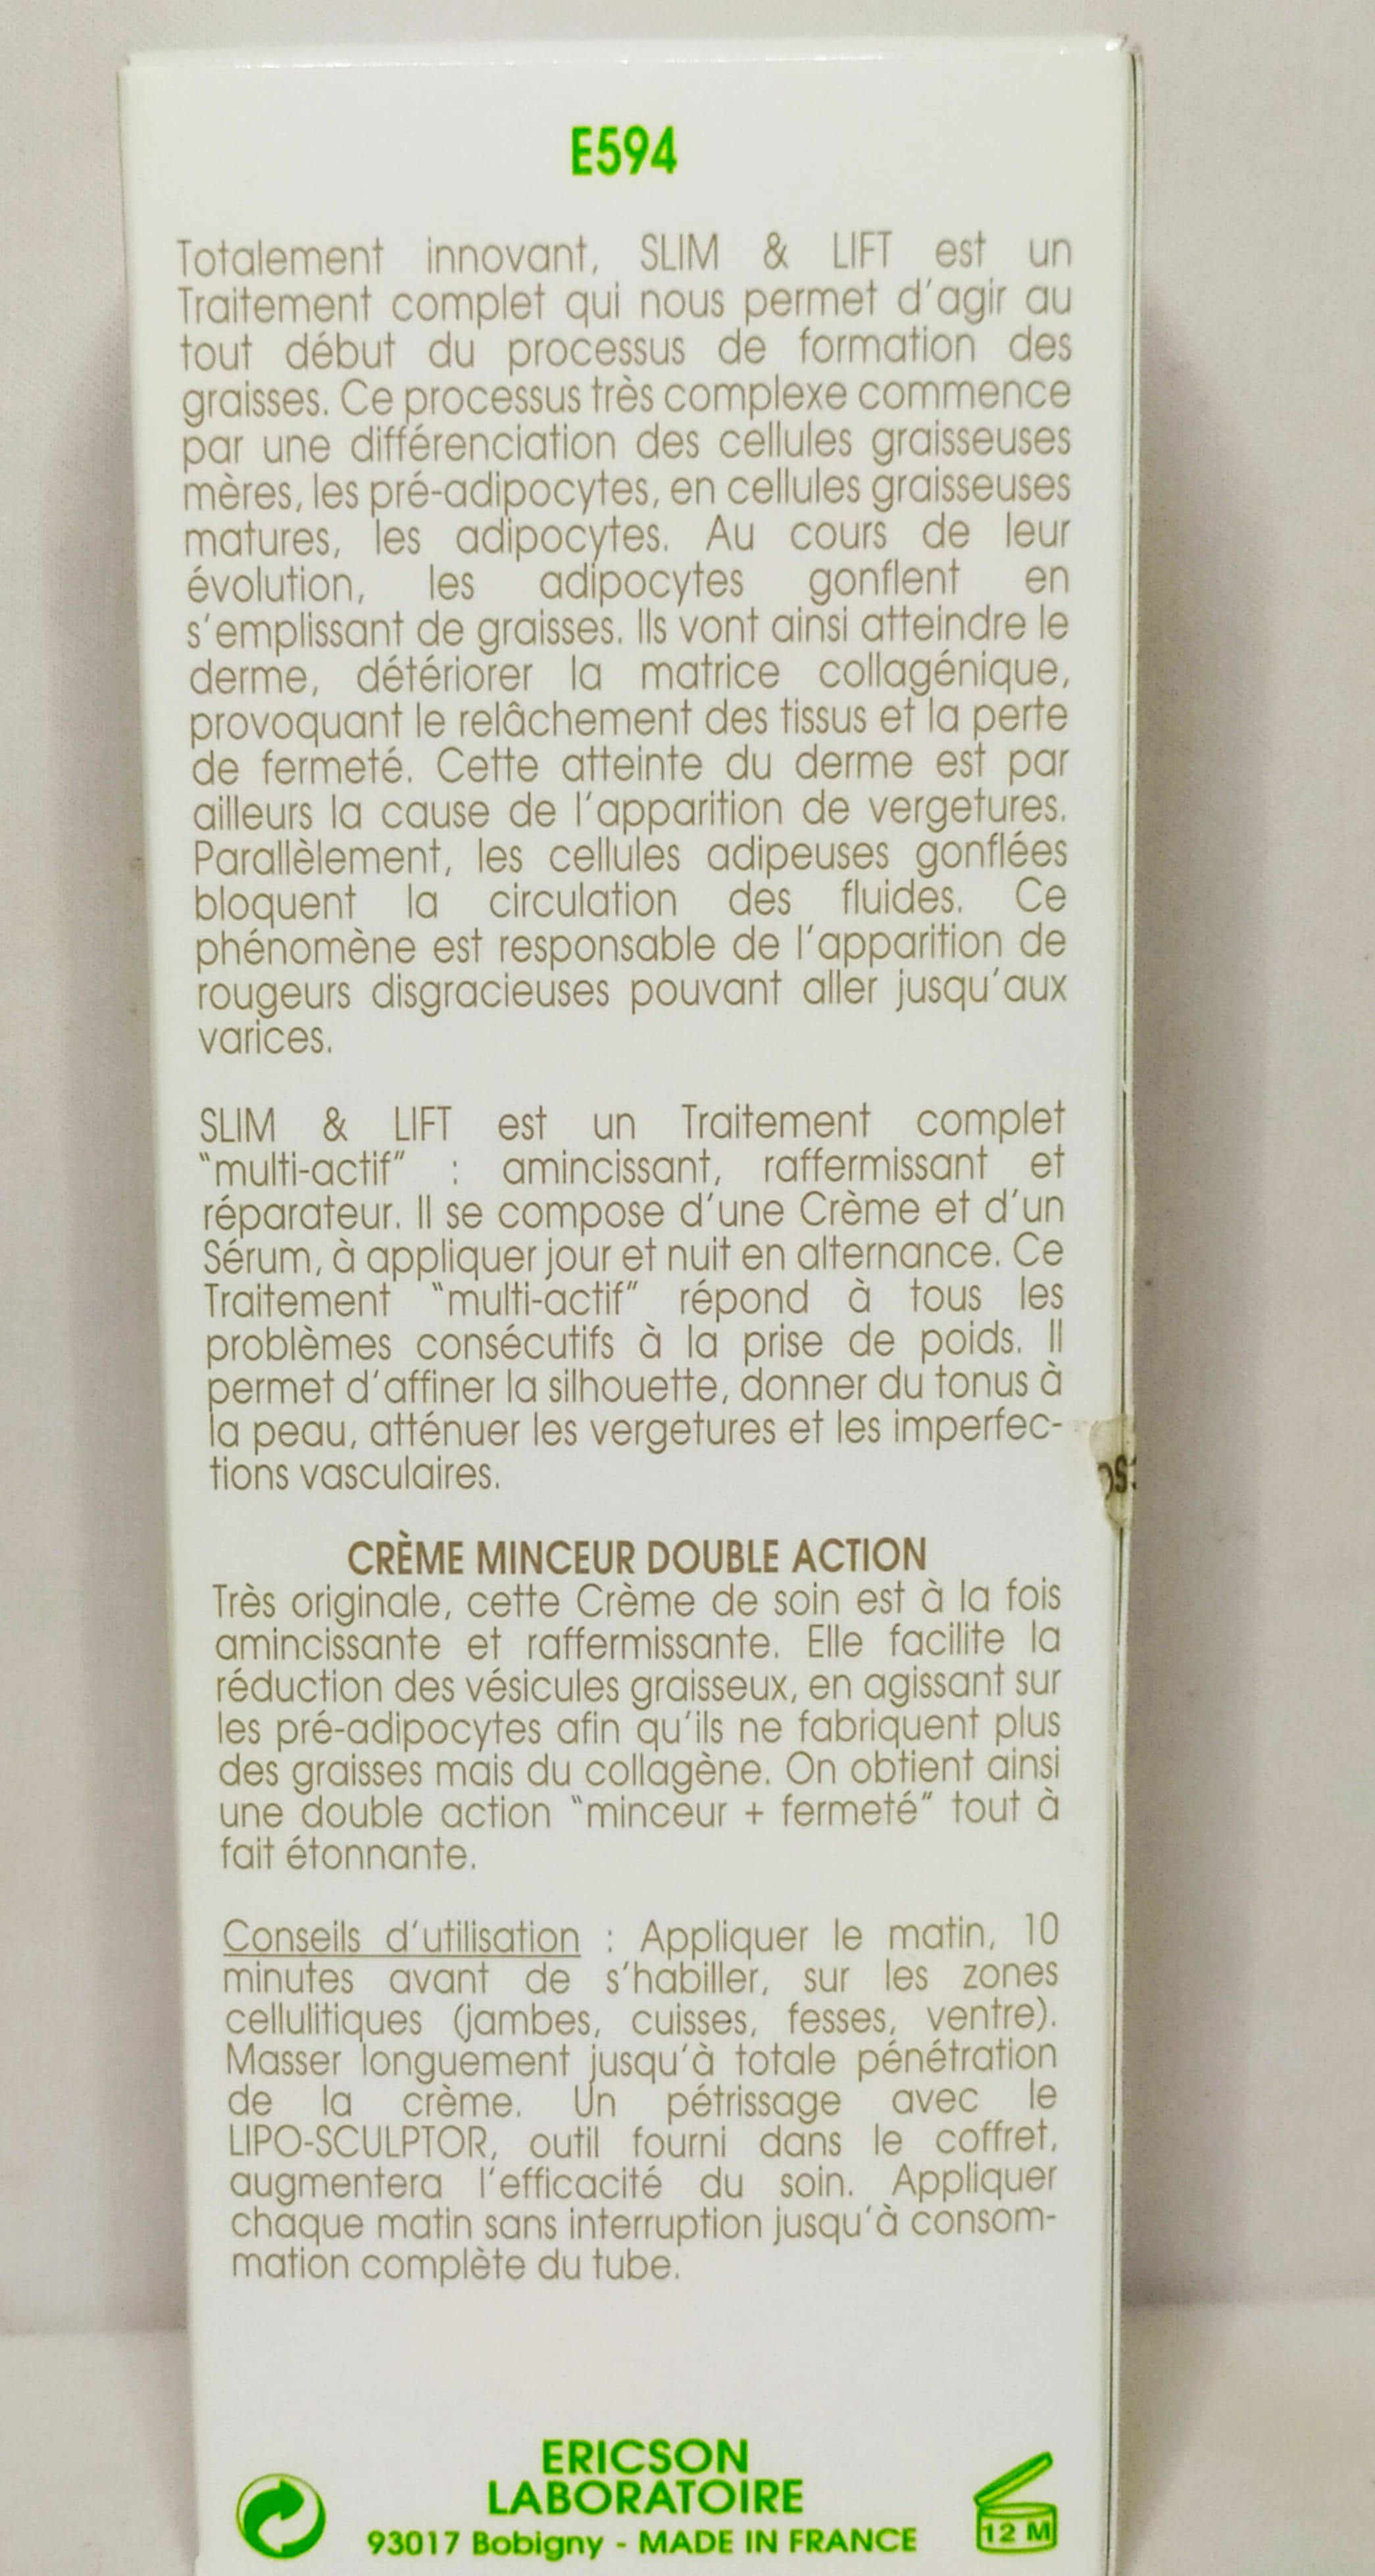 SLIM & LIFT - DUO MINCEUR